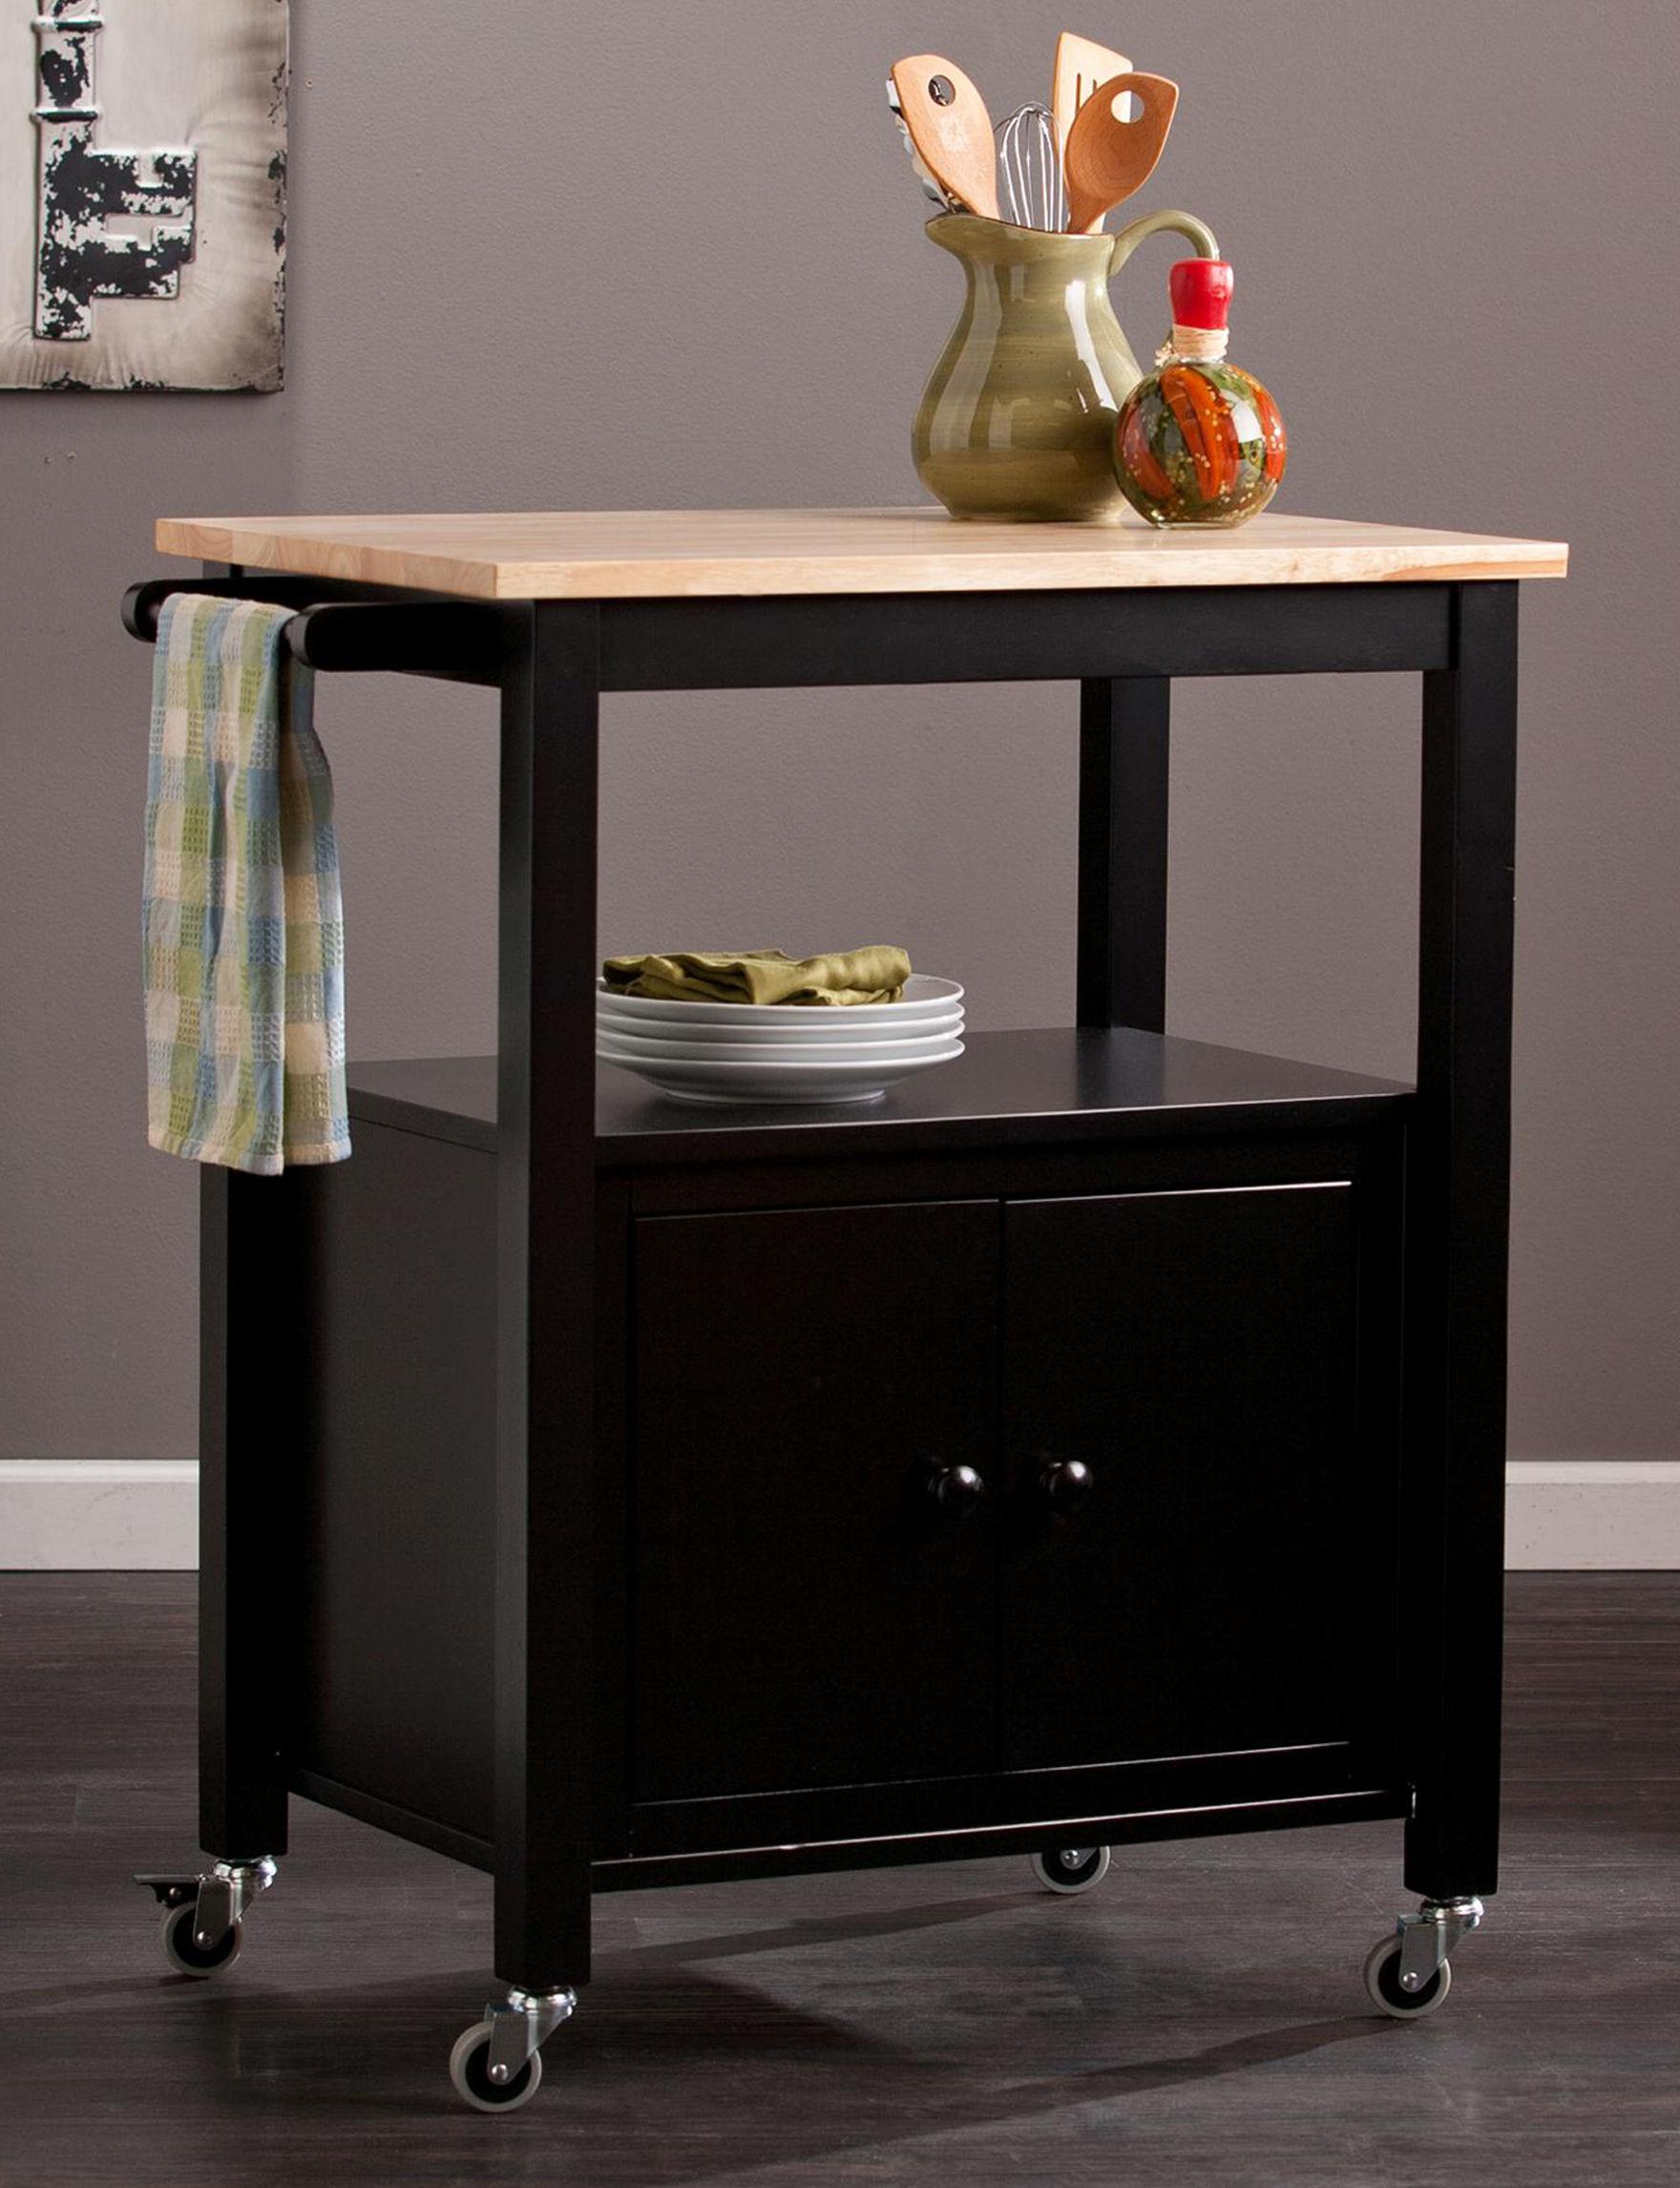 Southern Enterprises Black Kitchen Islands & Carts Kitchen & Dining Furniture